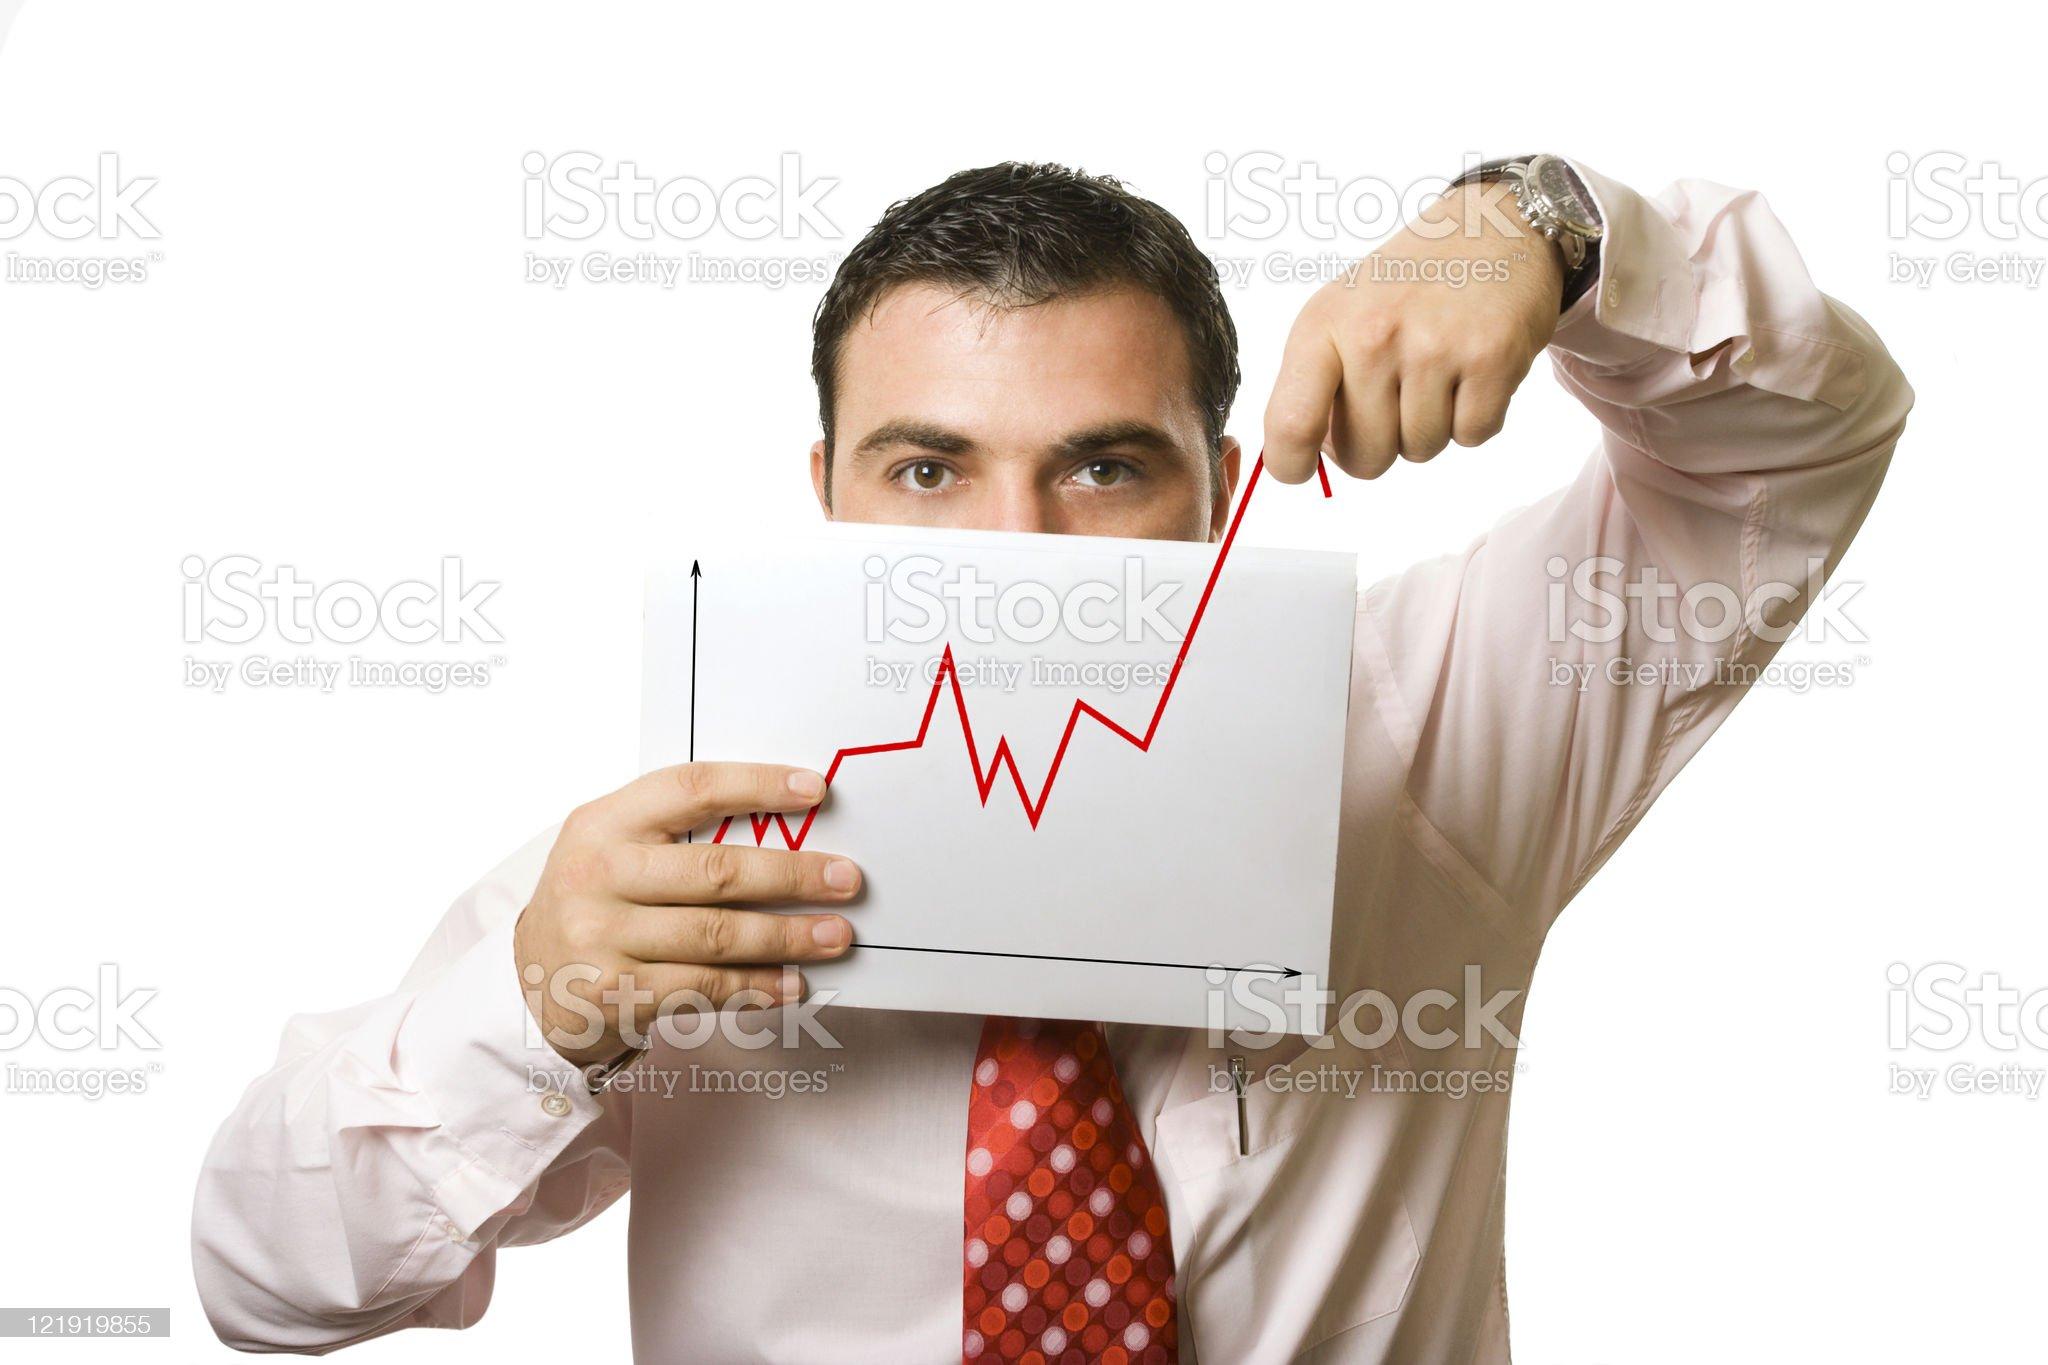 man showing false progress royalty-free stock photo